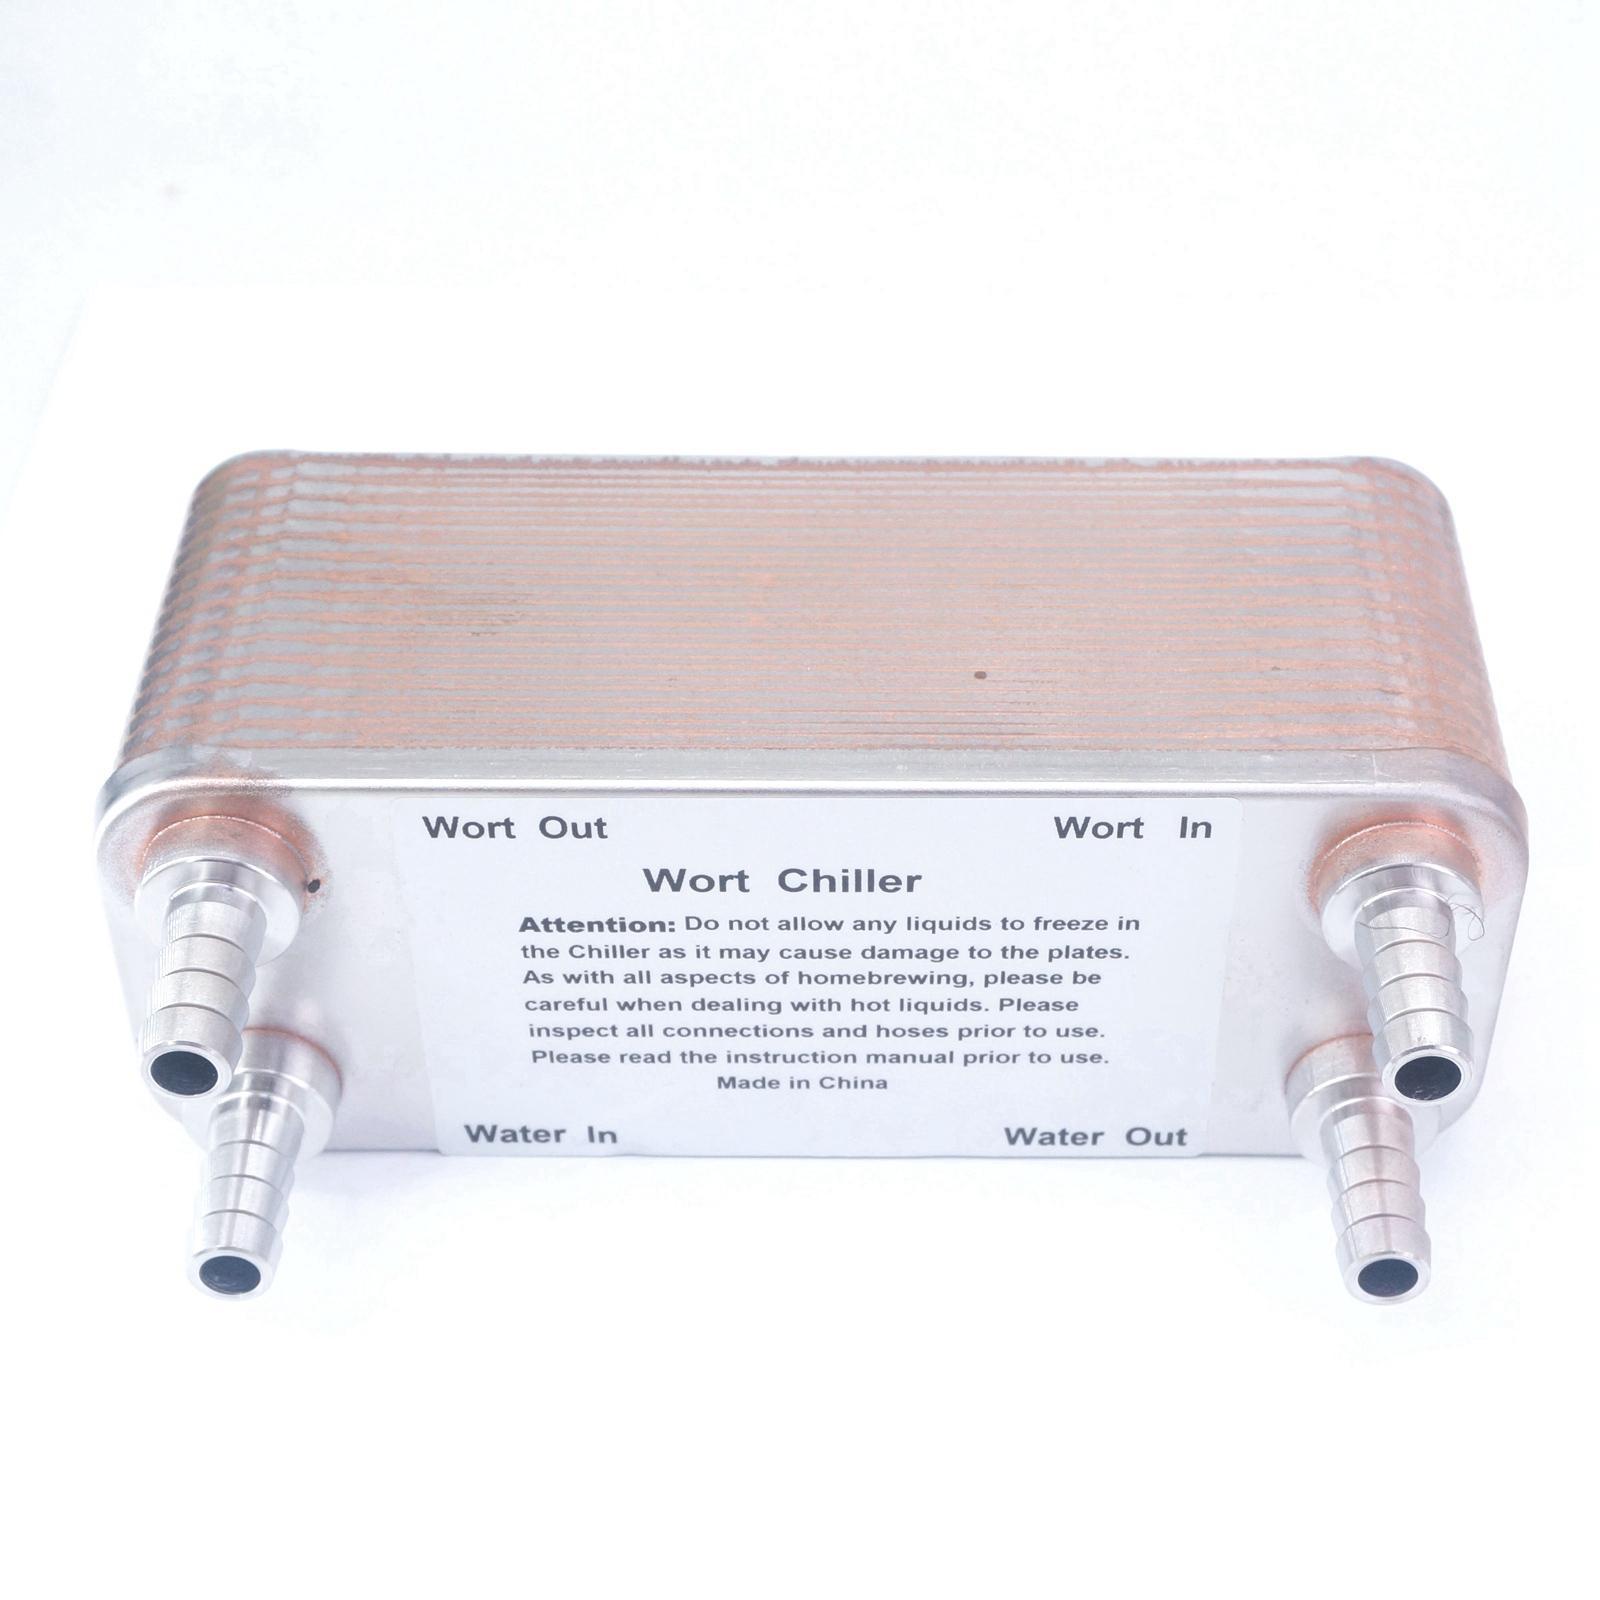 30 Plates Wort Chiller 304 Stainless Homebrew Heat Exchanger 1/2 Hose Barb 0.336m2